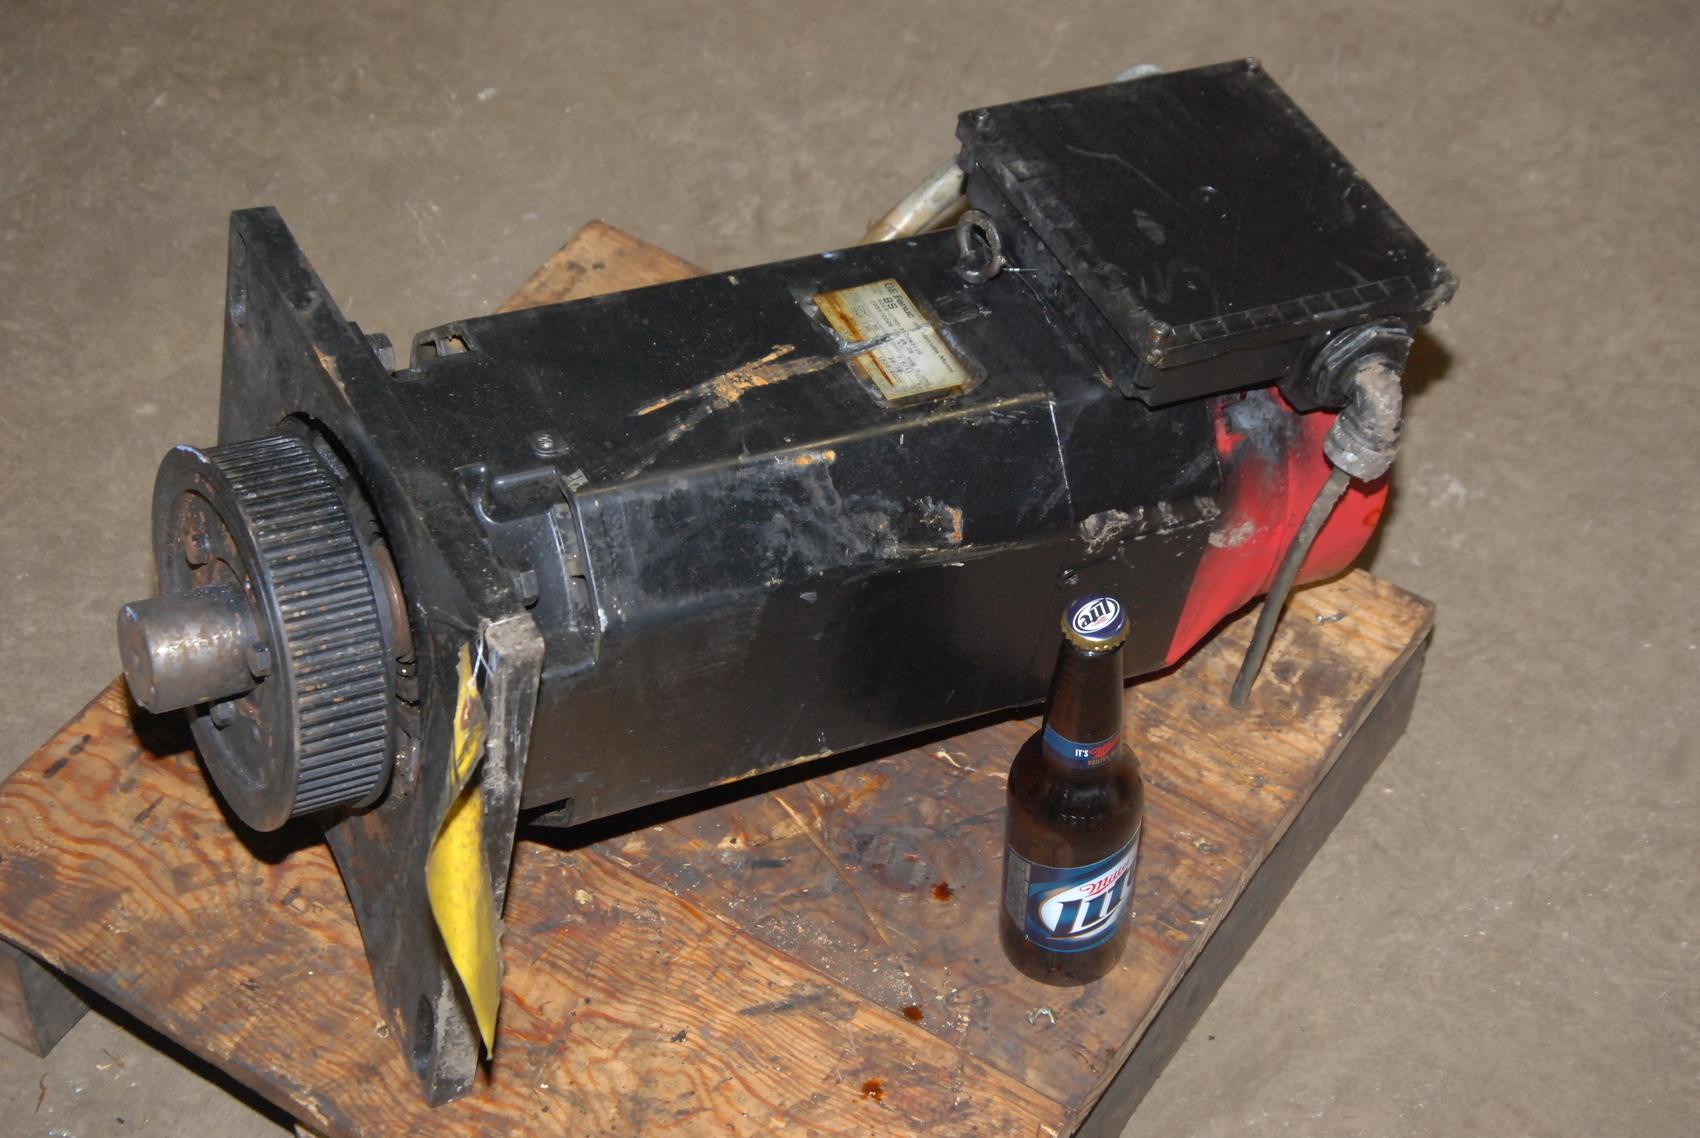 FANUC AC SPINDLE MOTOR 8S,A06B-0755-B100,7.5/11KW